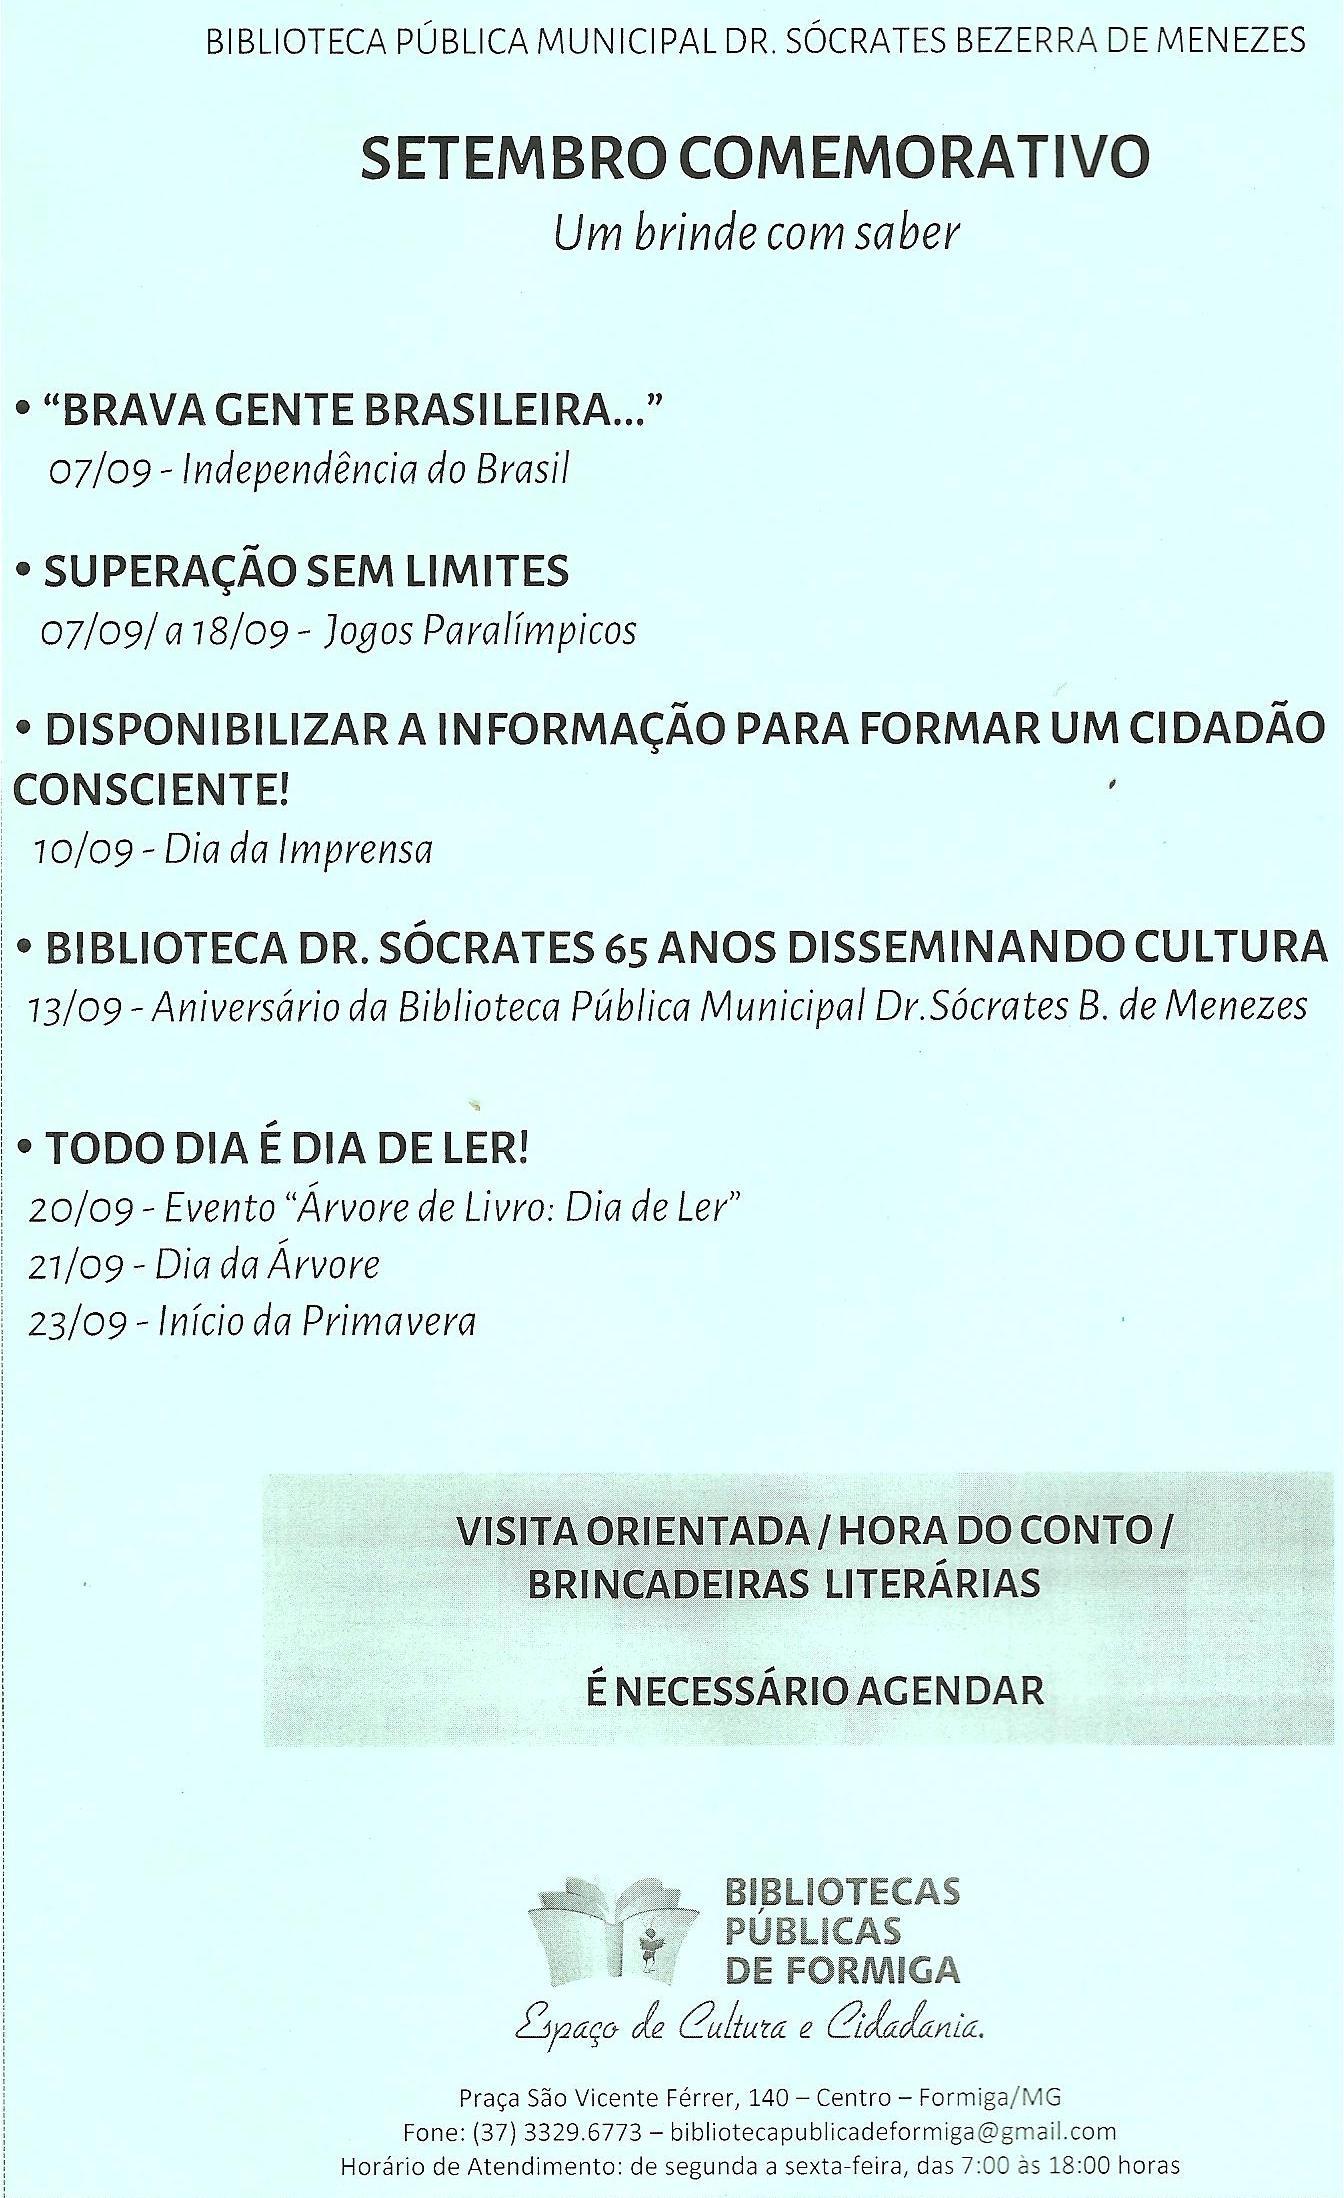 Biblioteca Pública de Formiga